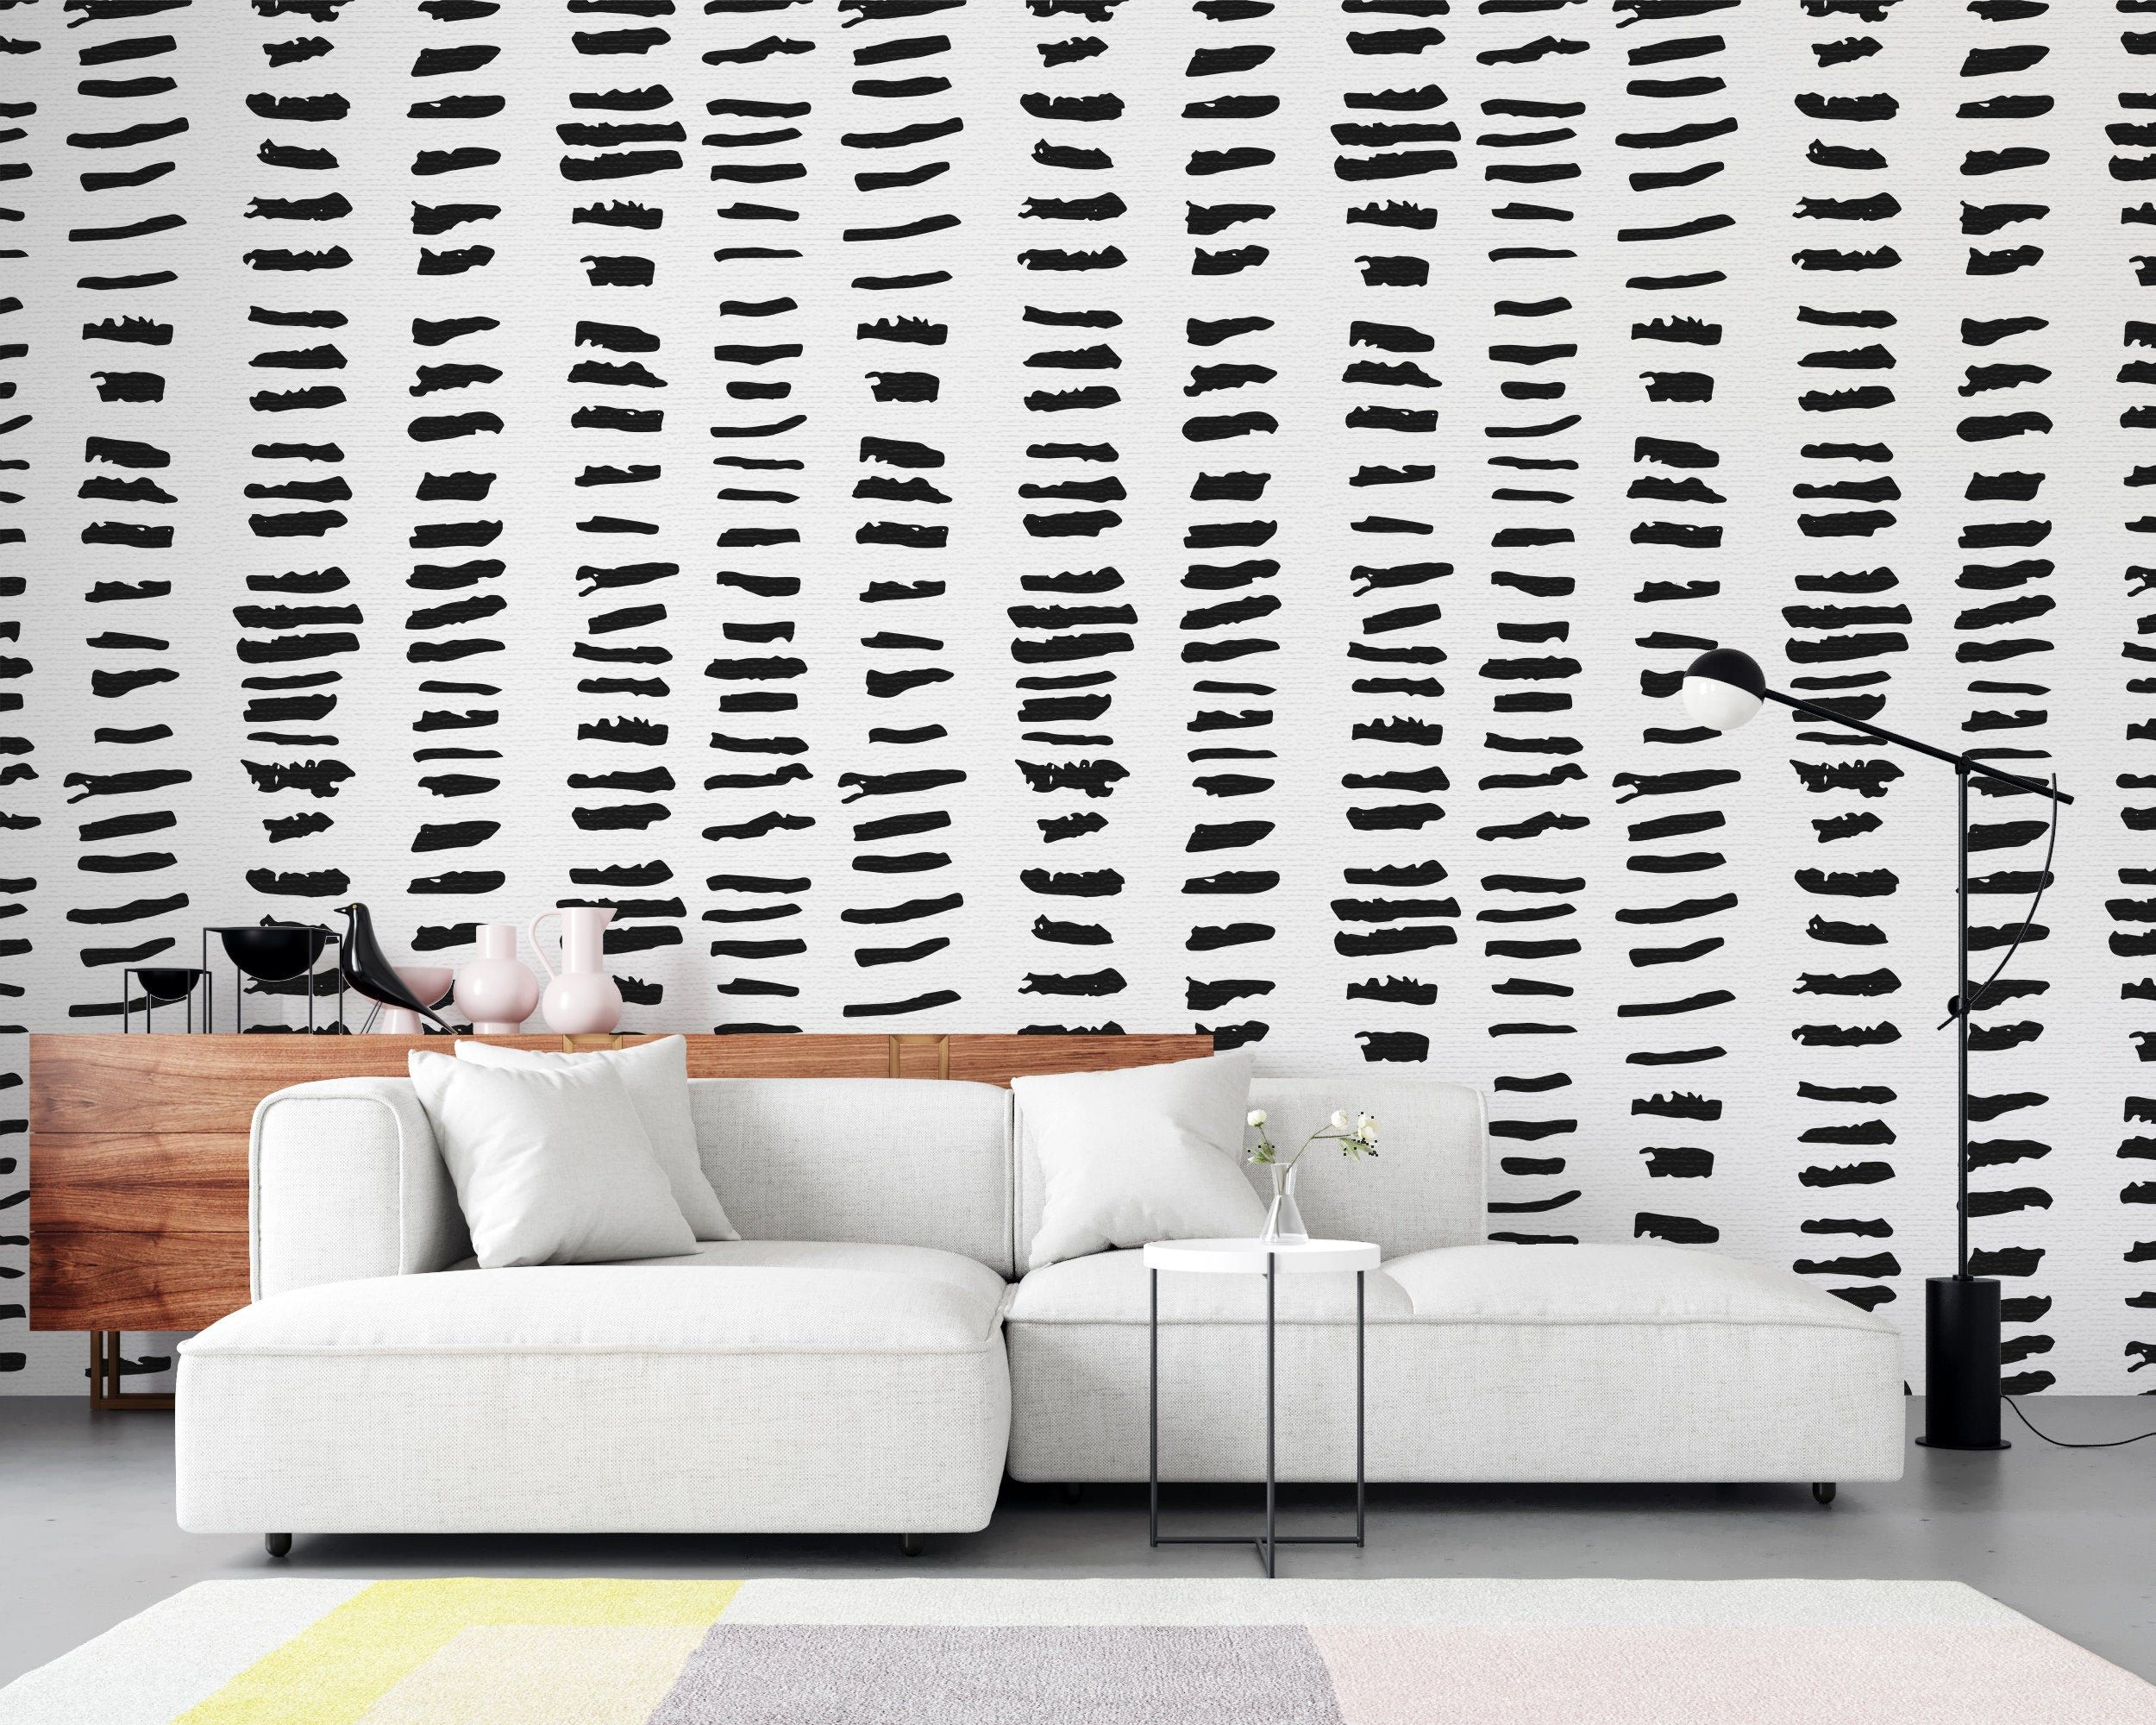 Geometric Striped Removable Wallpaper Reusable Wall Art Peel And Stick Room Decor Self Adhesive Wall Mu Removable Wallpaper Kid Room Style Striped Wallpaper